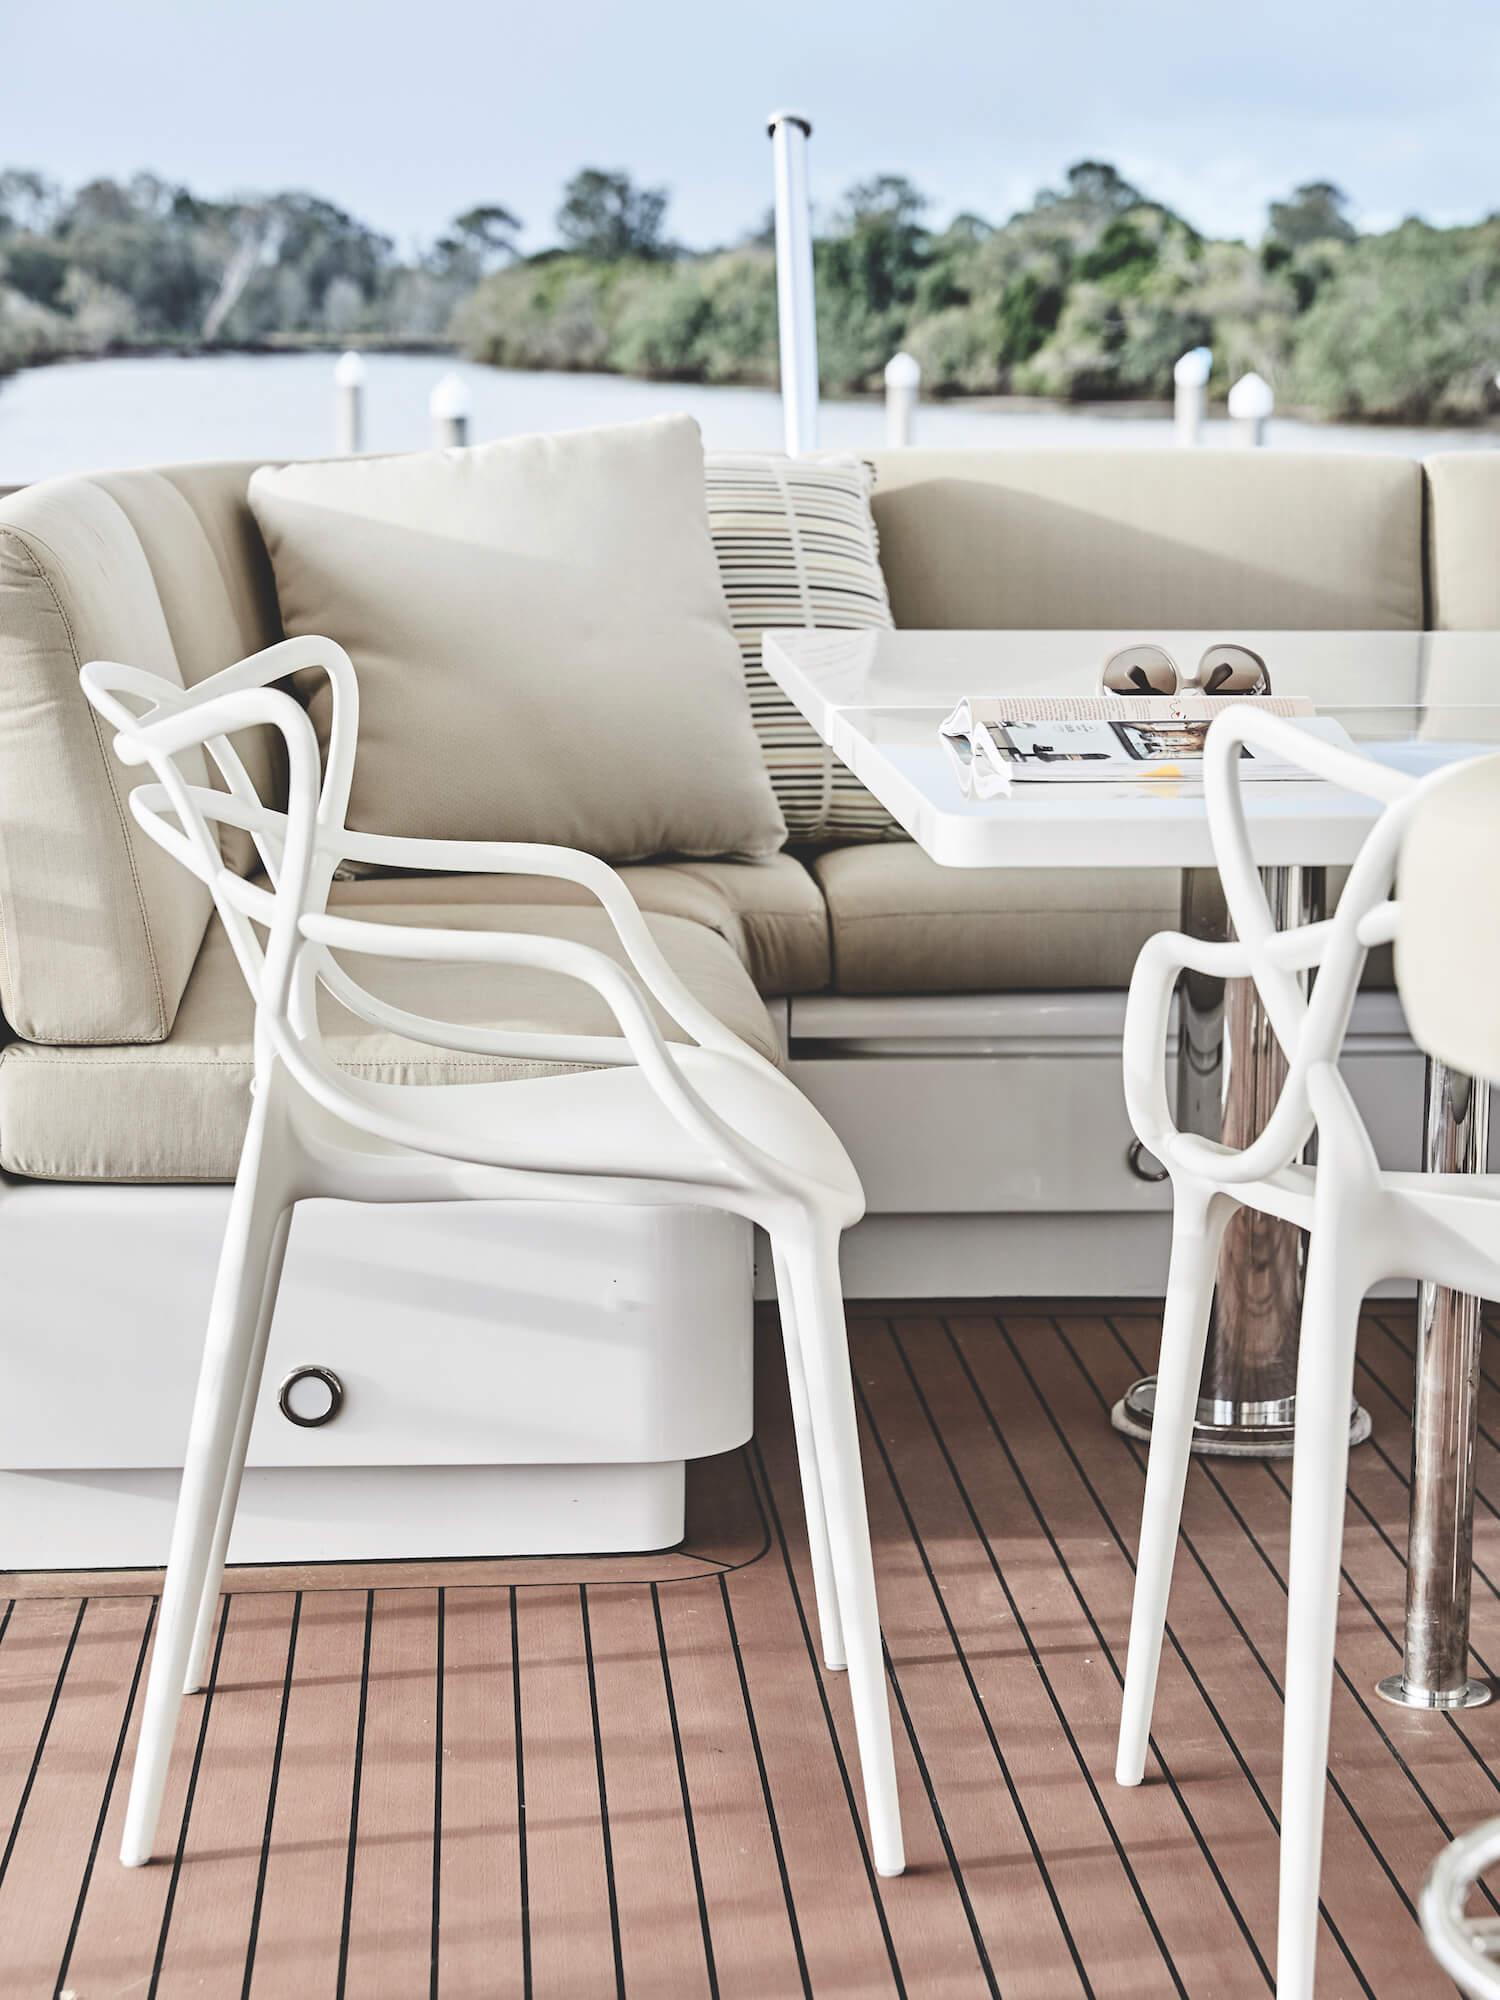 est living architecture robert bruce boat nexus designs 12